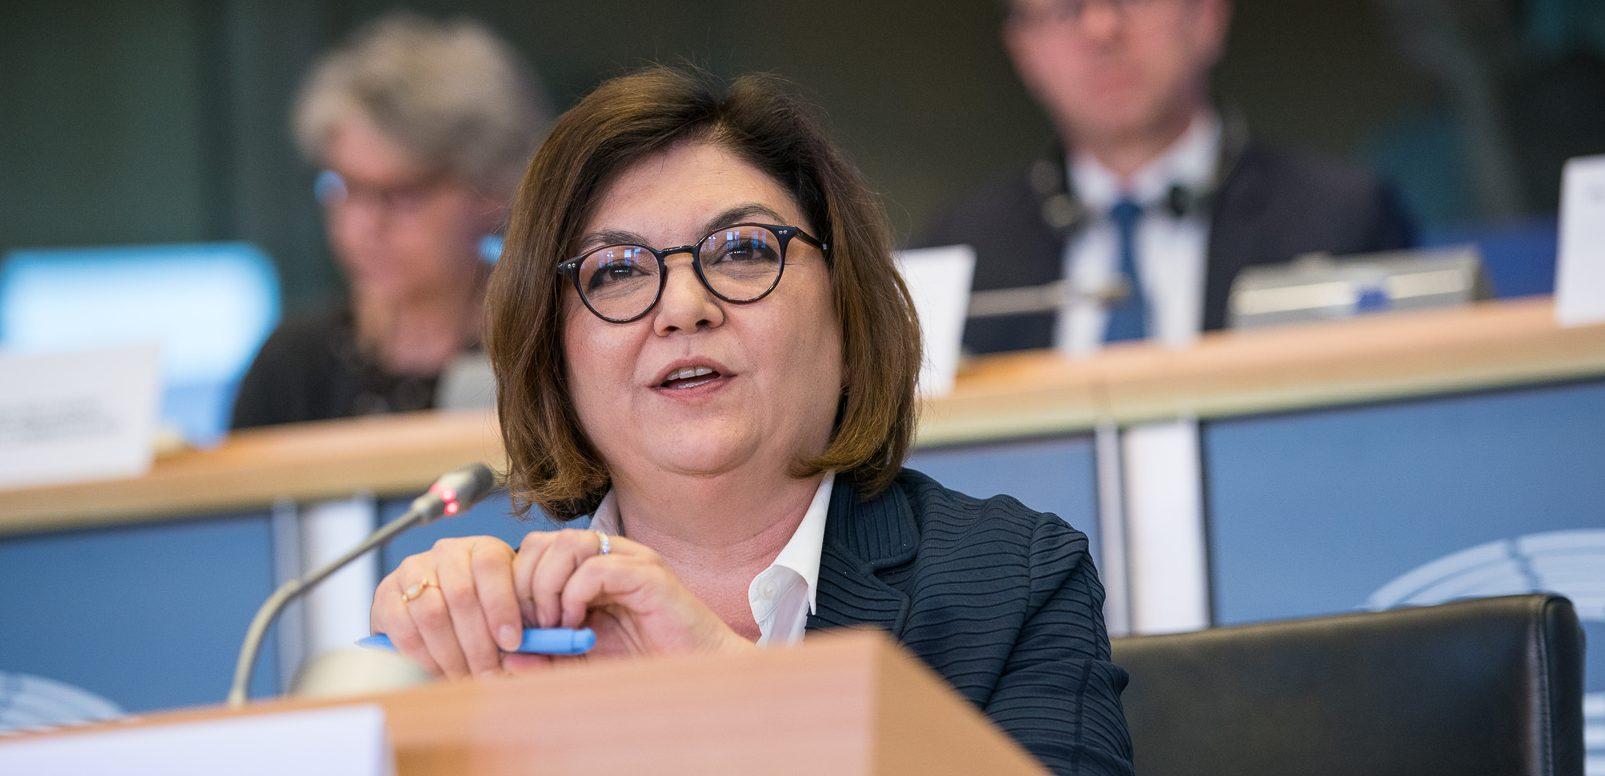 Meet the new transport commissioner of the European Union: Adina Vălean